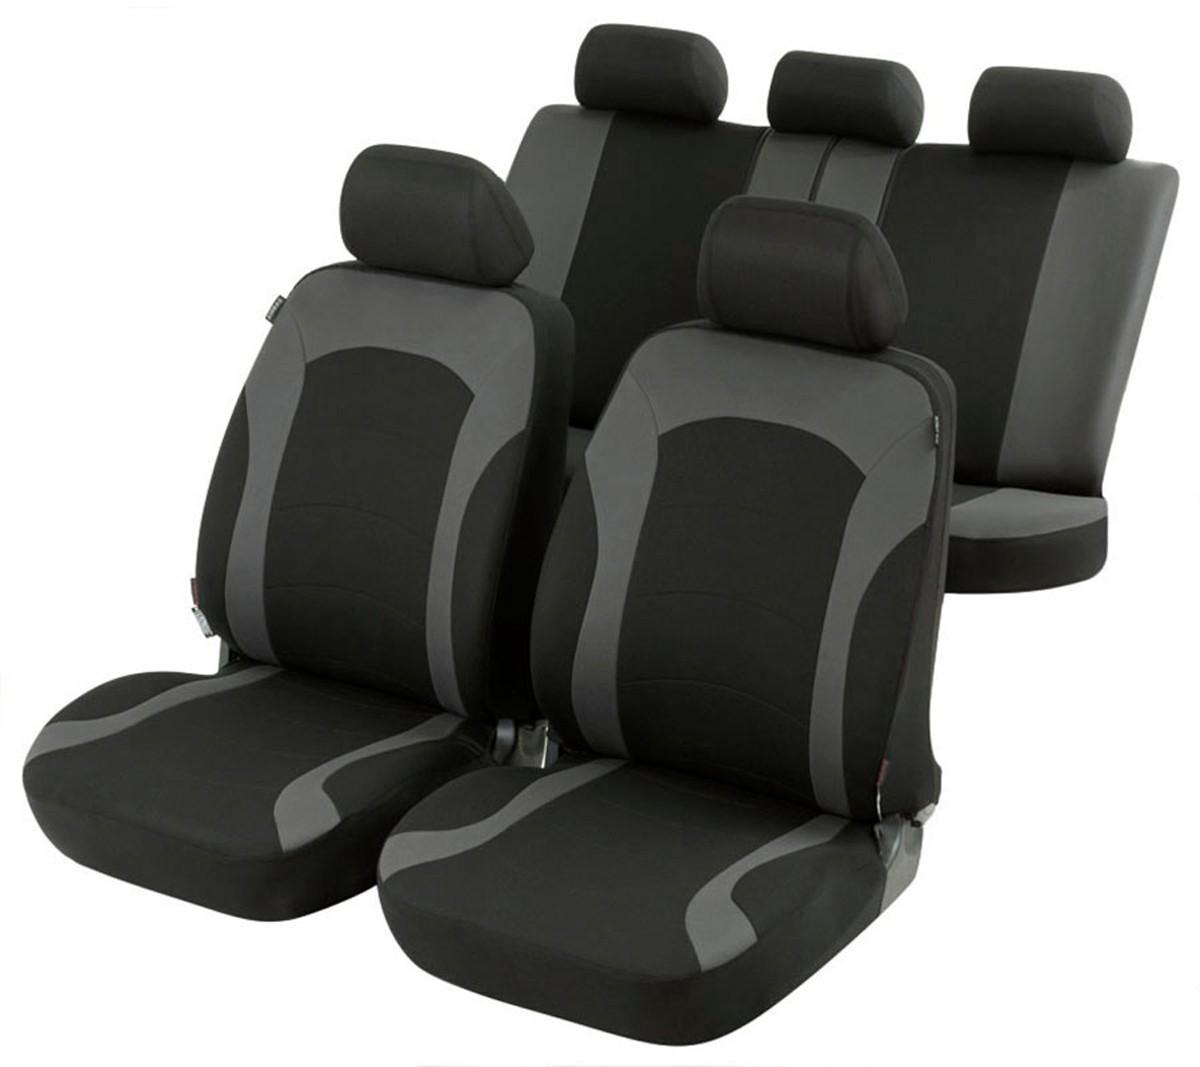 Schwarze Sitzbezüge für BMW SERIE 5 Autositzbezug Komplett